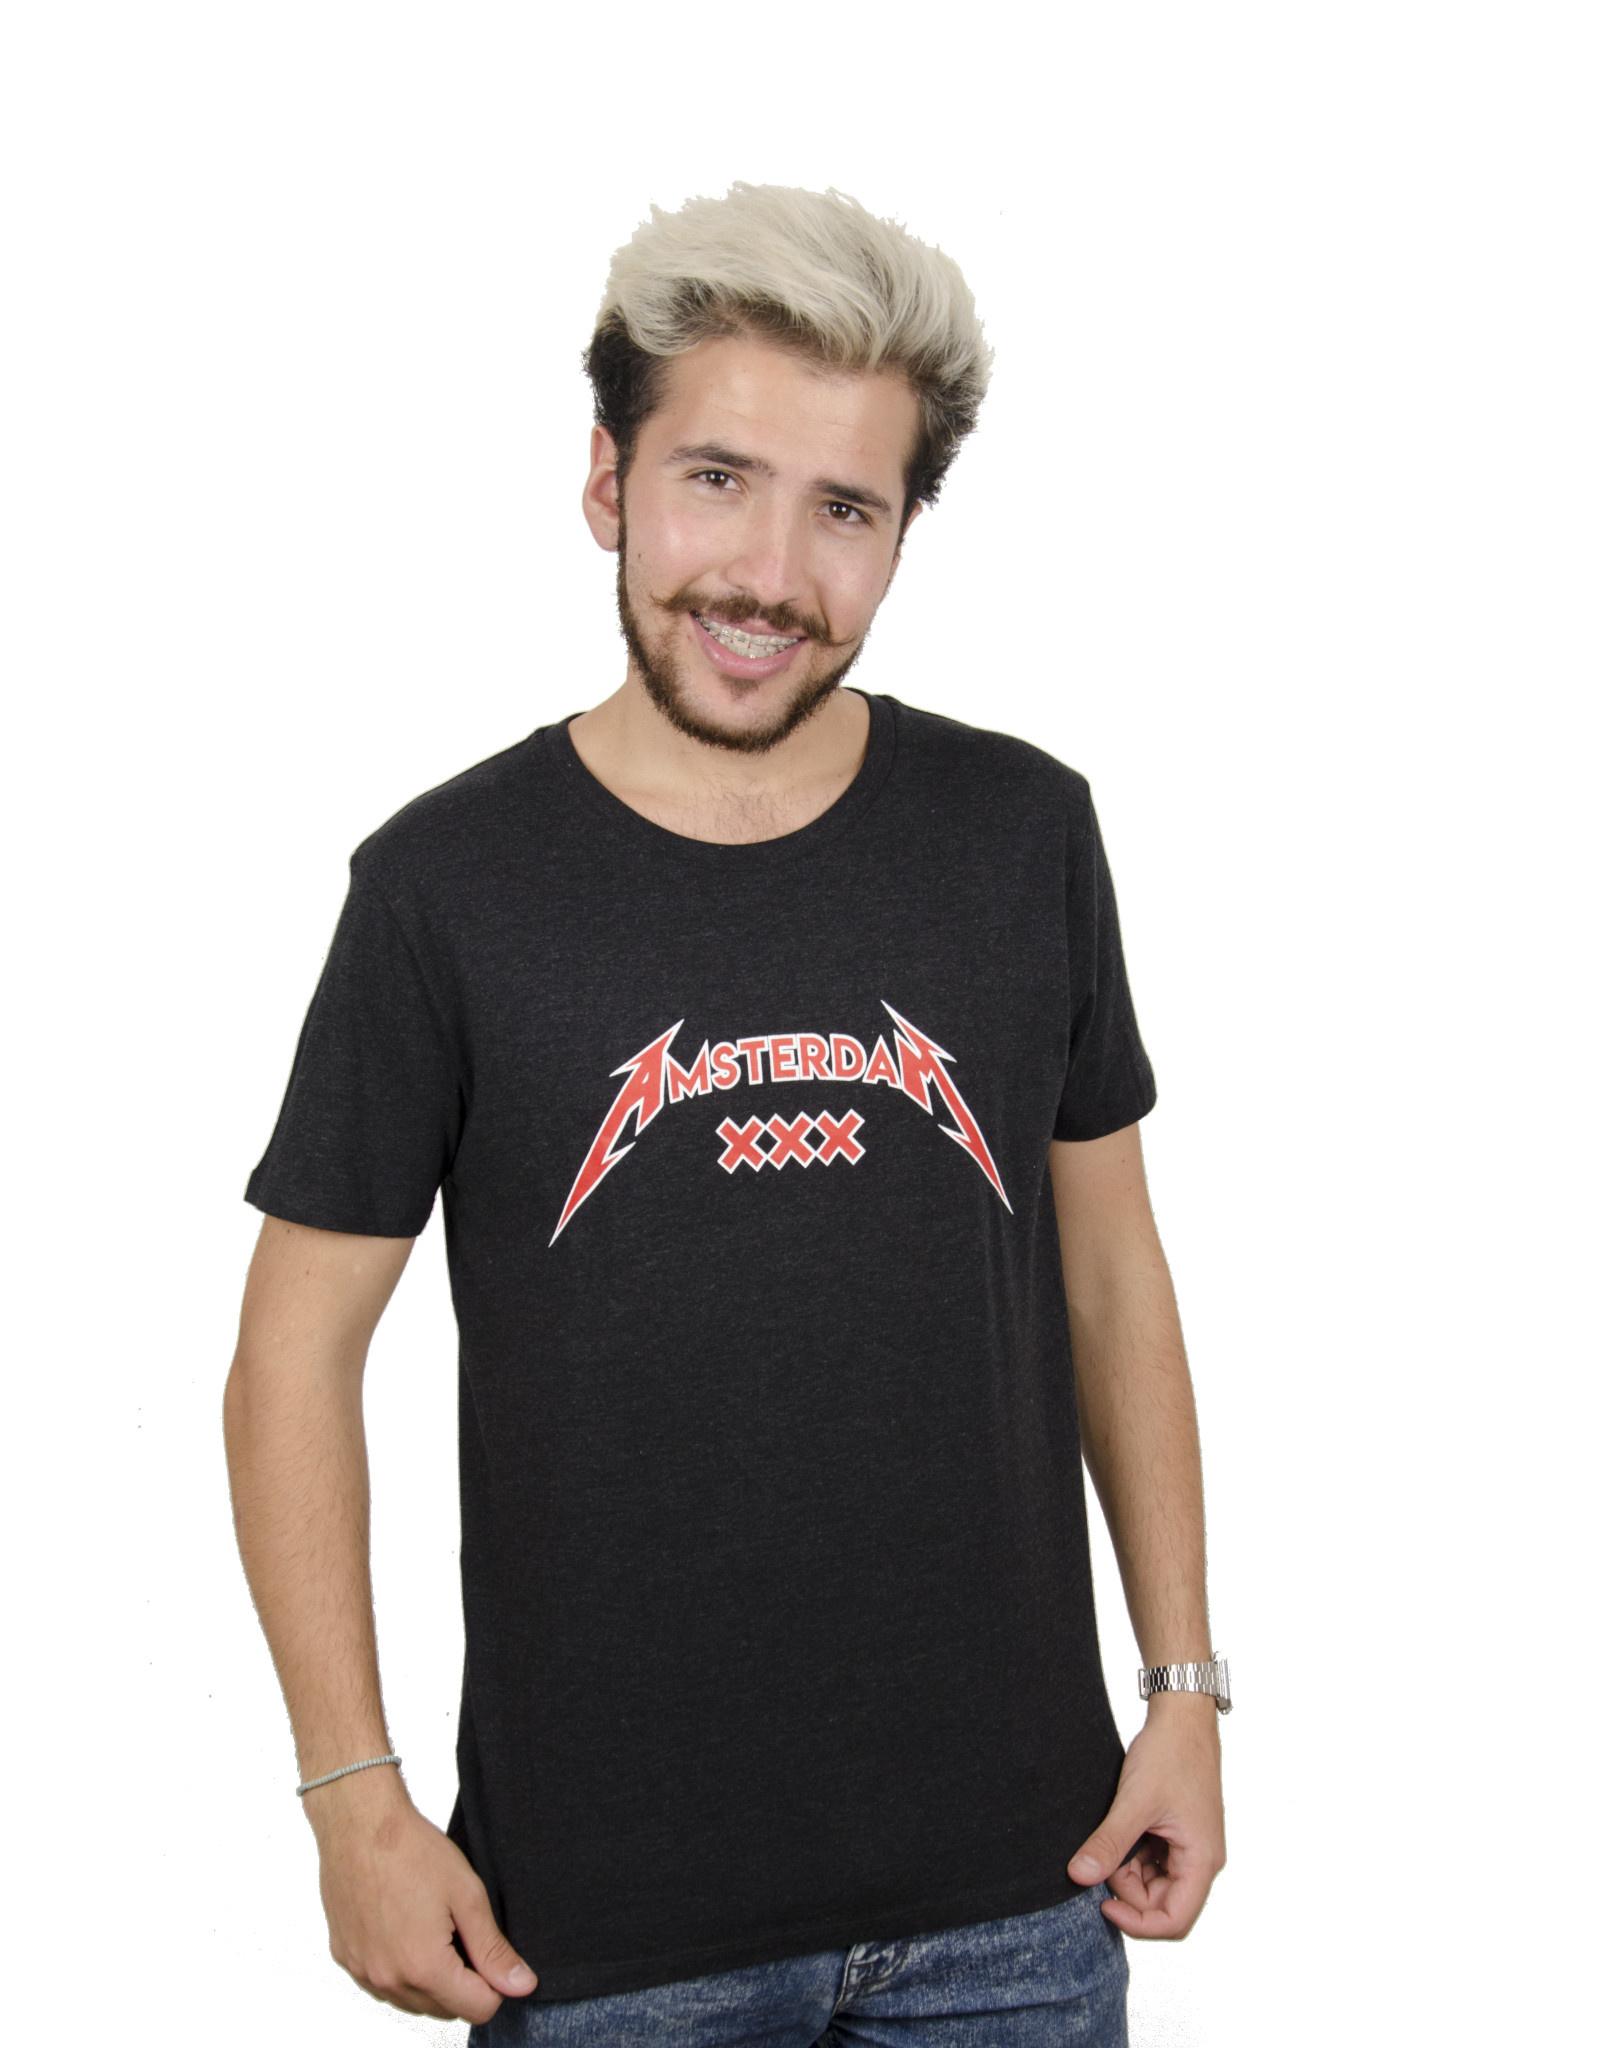 AmsterdaM XXX T-shirt